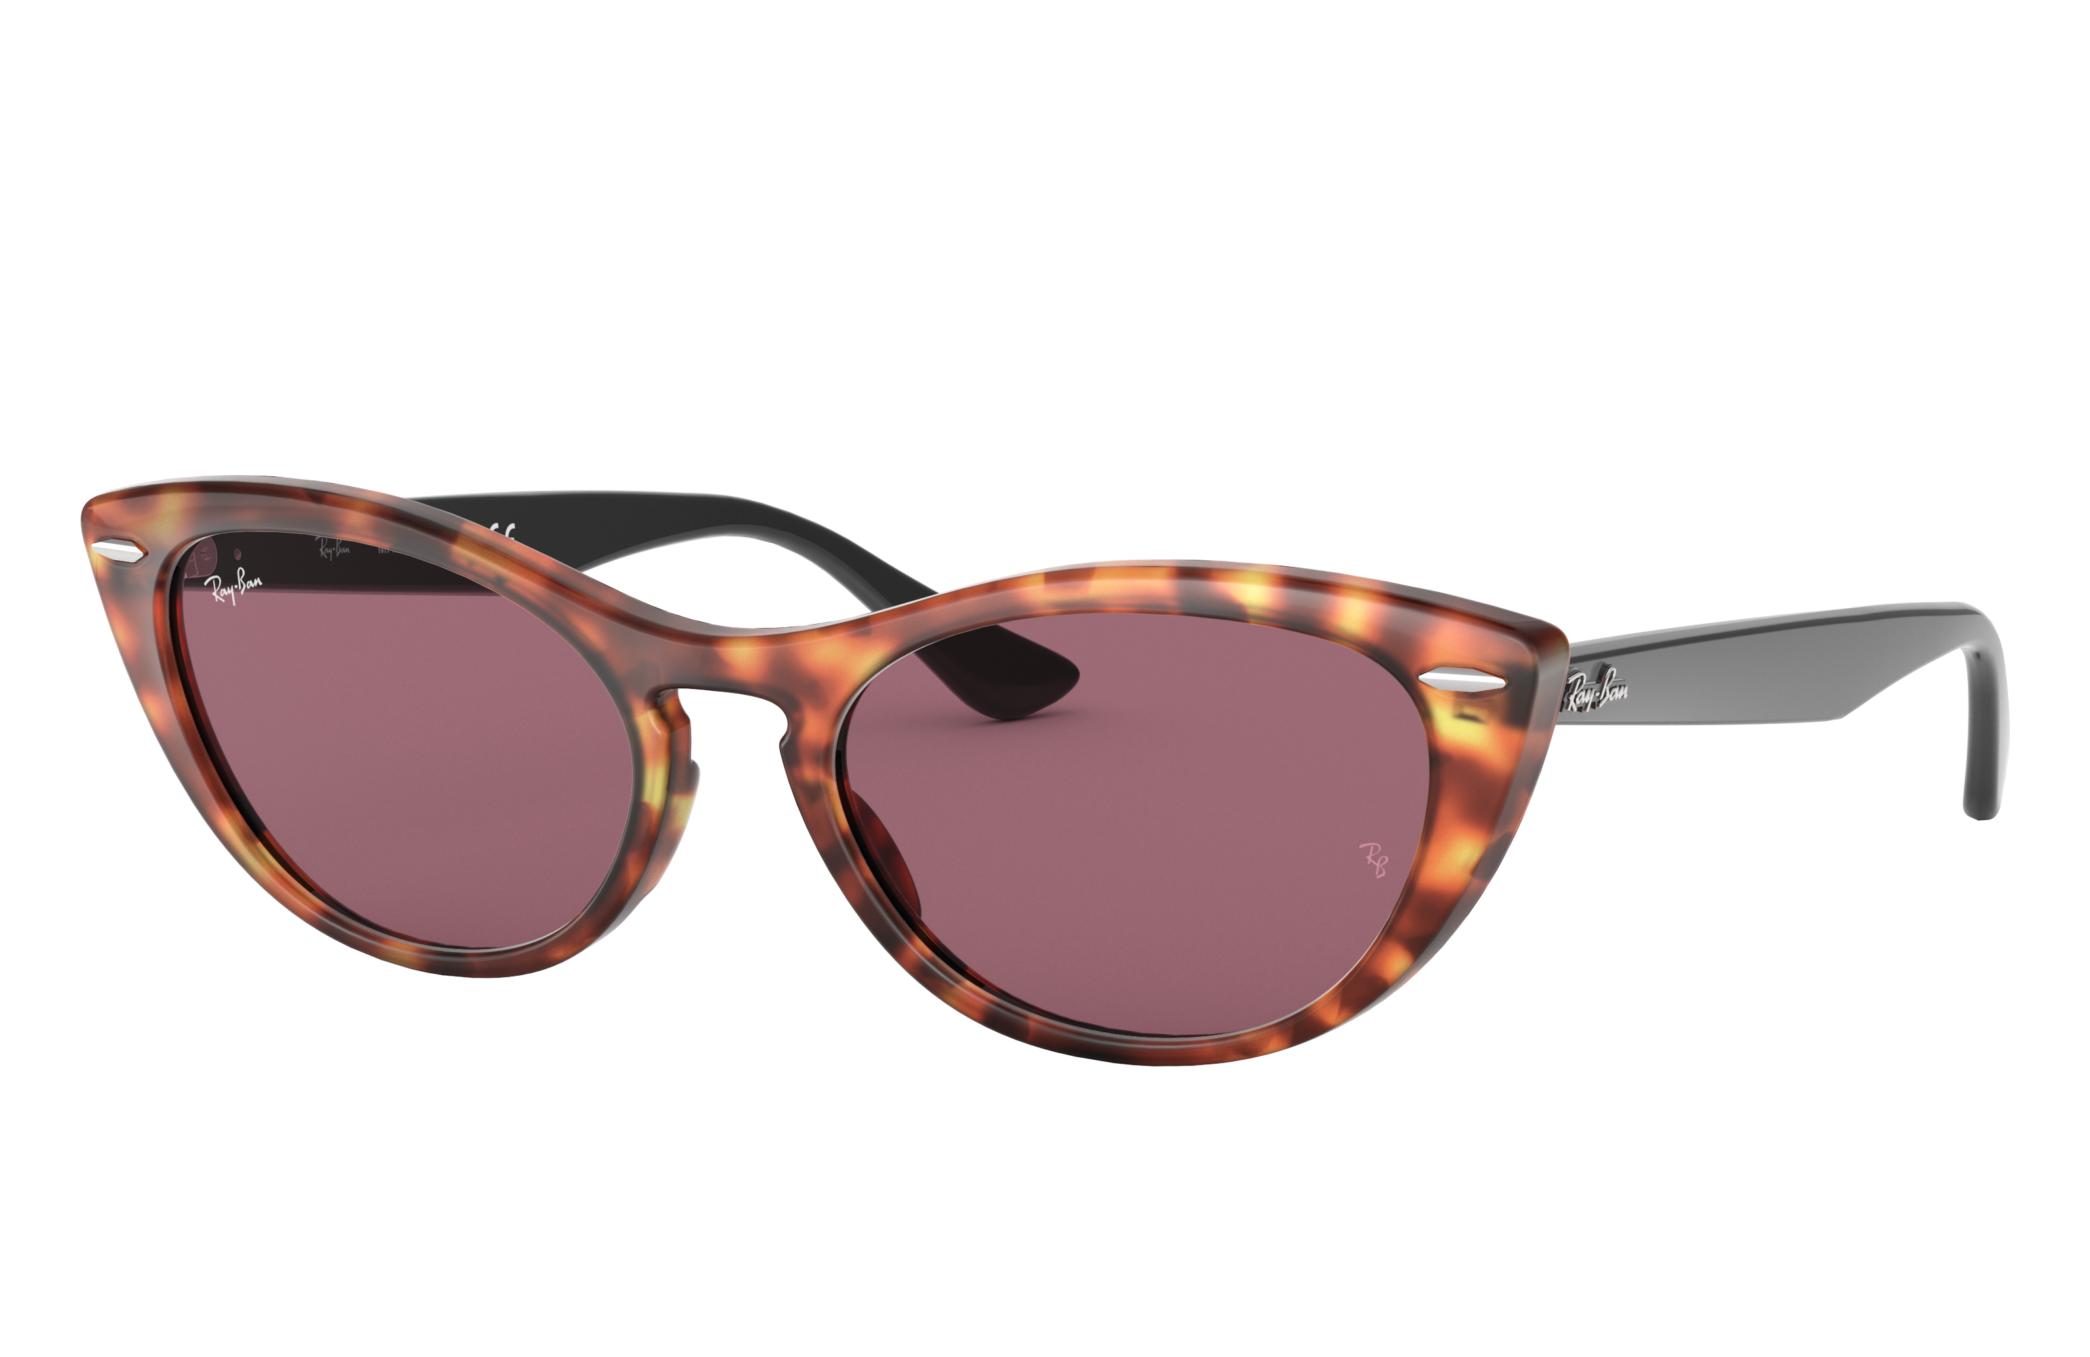 Ray-Ban Nina Black, Violet Lenses - RB4314N